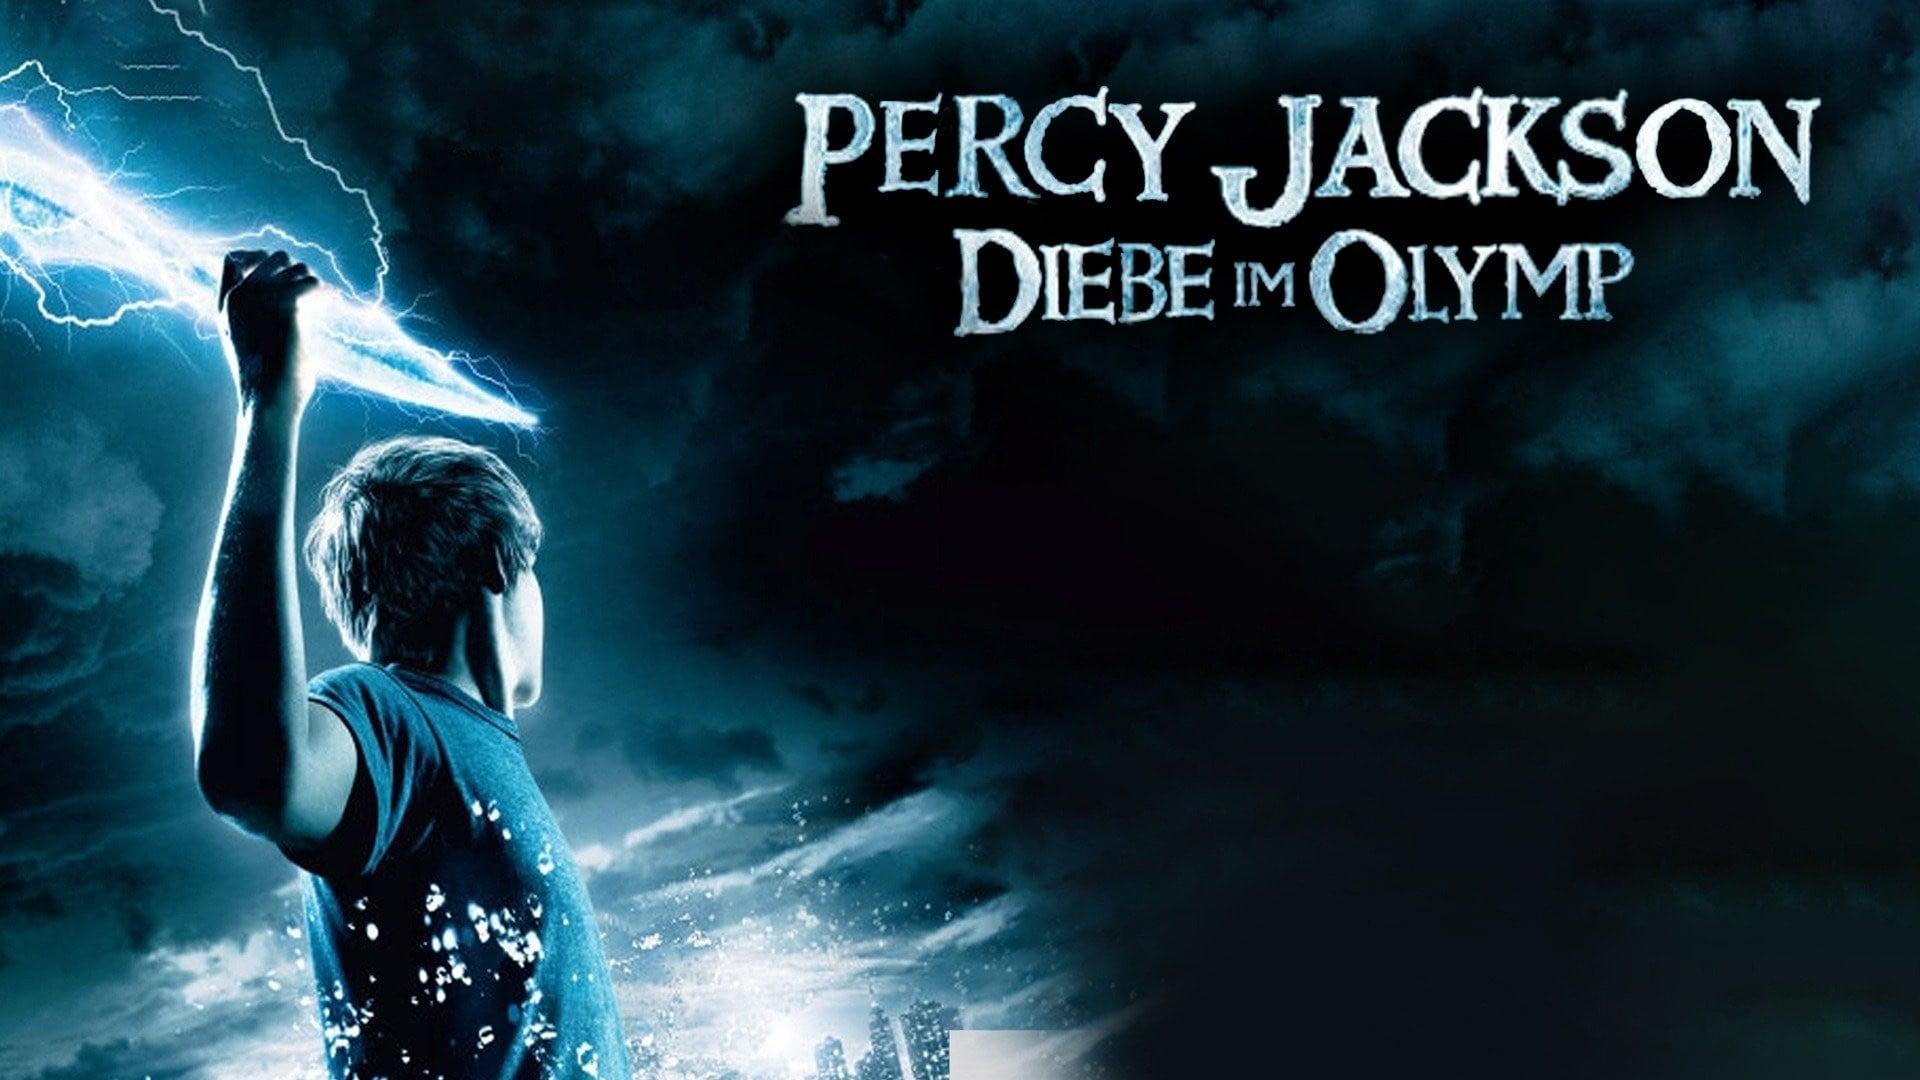 Percy Jackson & the Olympians: The Lightning Thief